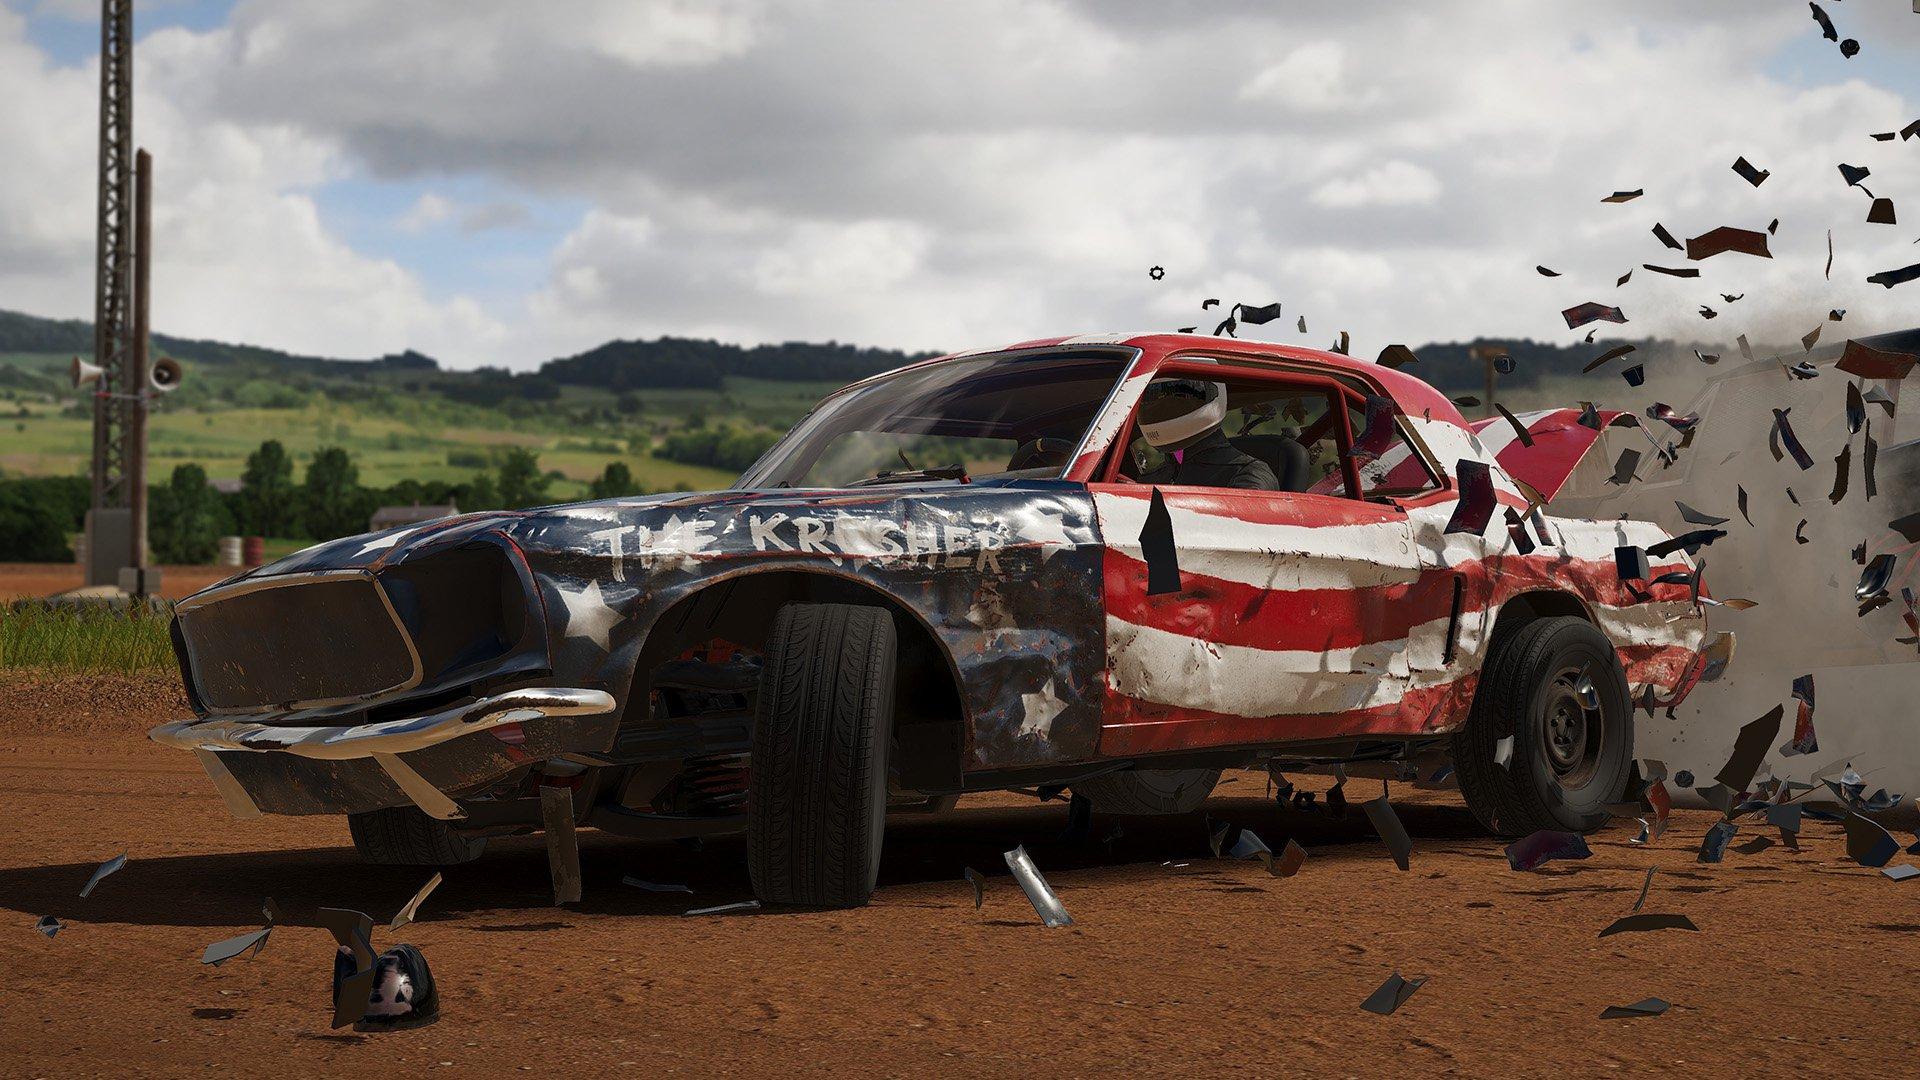 Next Car Game Wreckfest 8